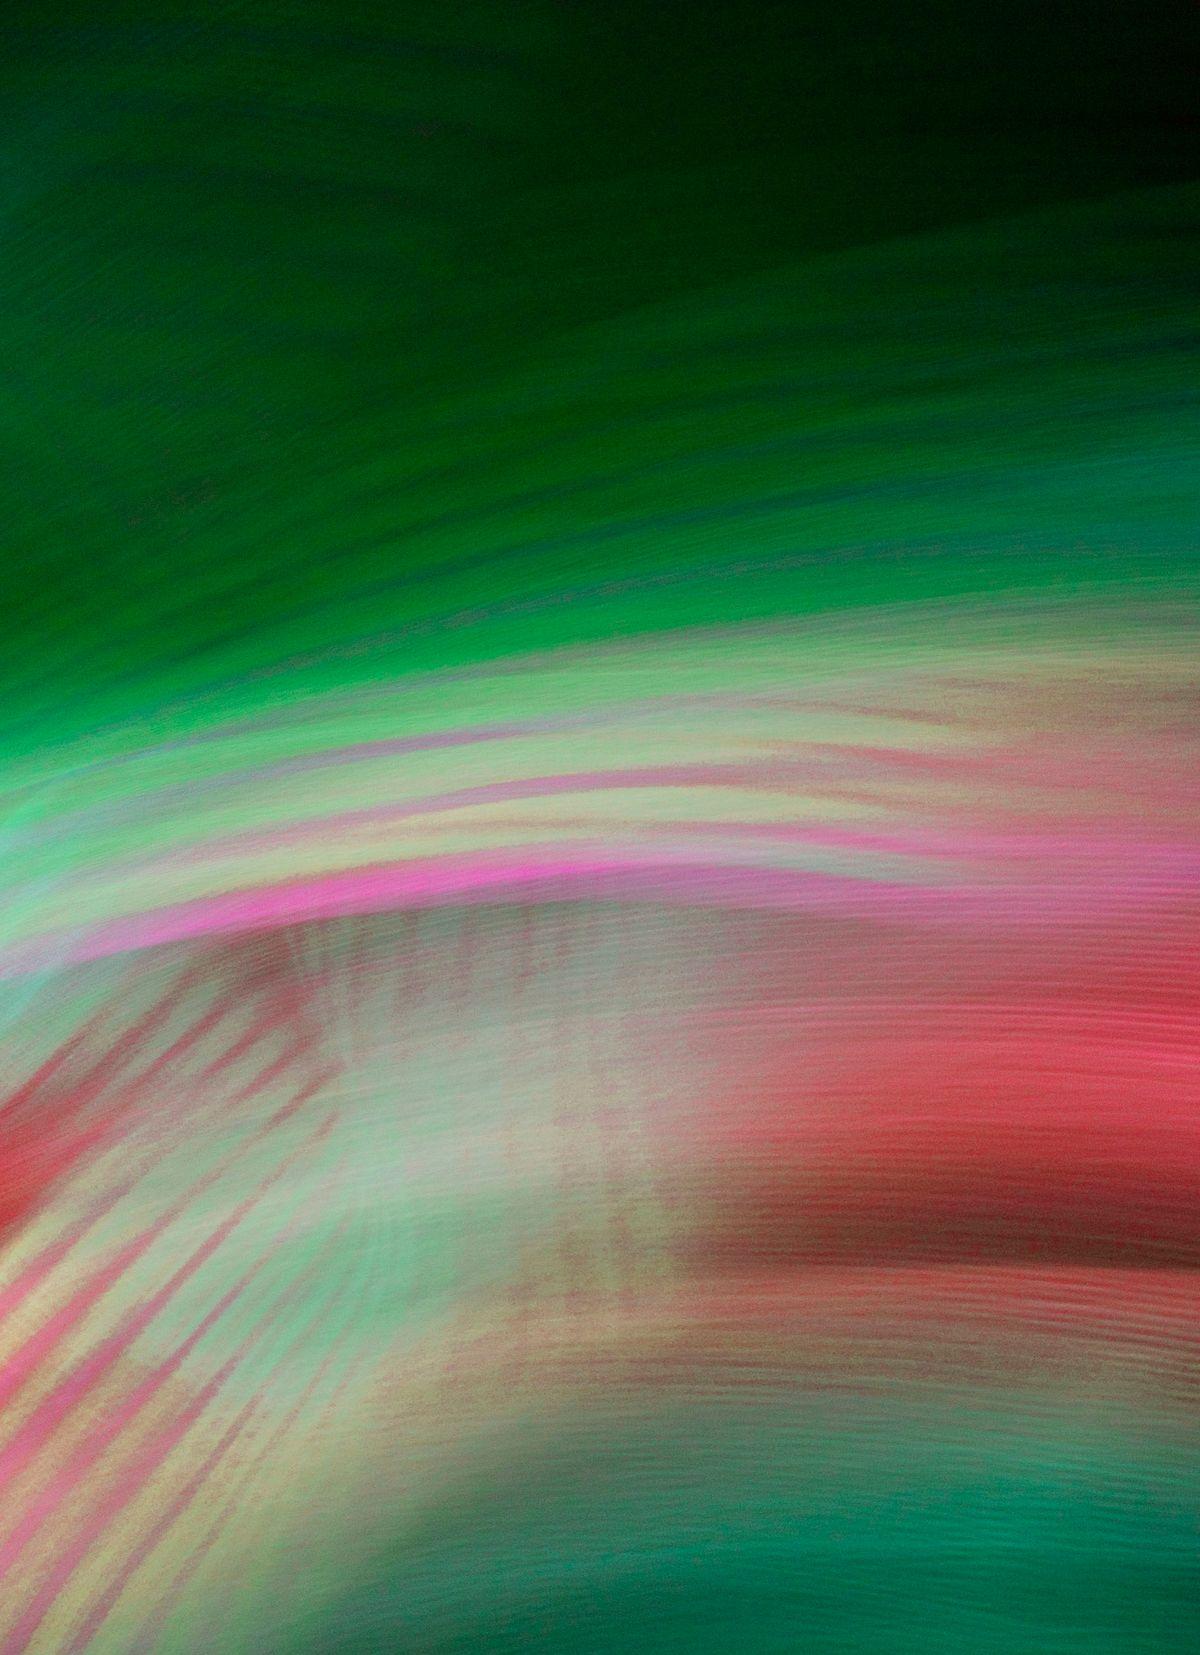 Orientalist III, 2009, Abstract Color Photography, Shirine Gill